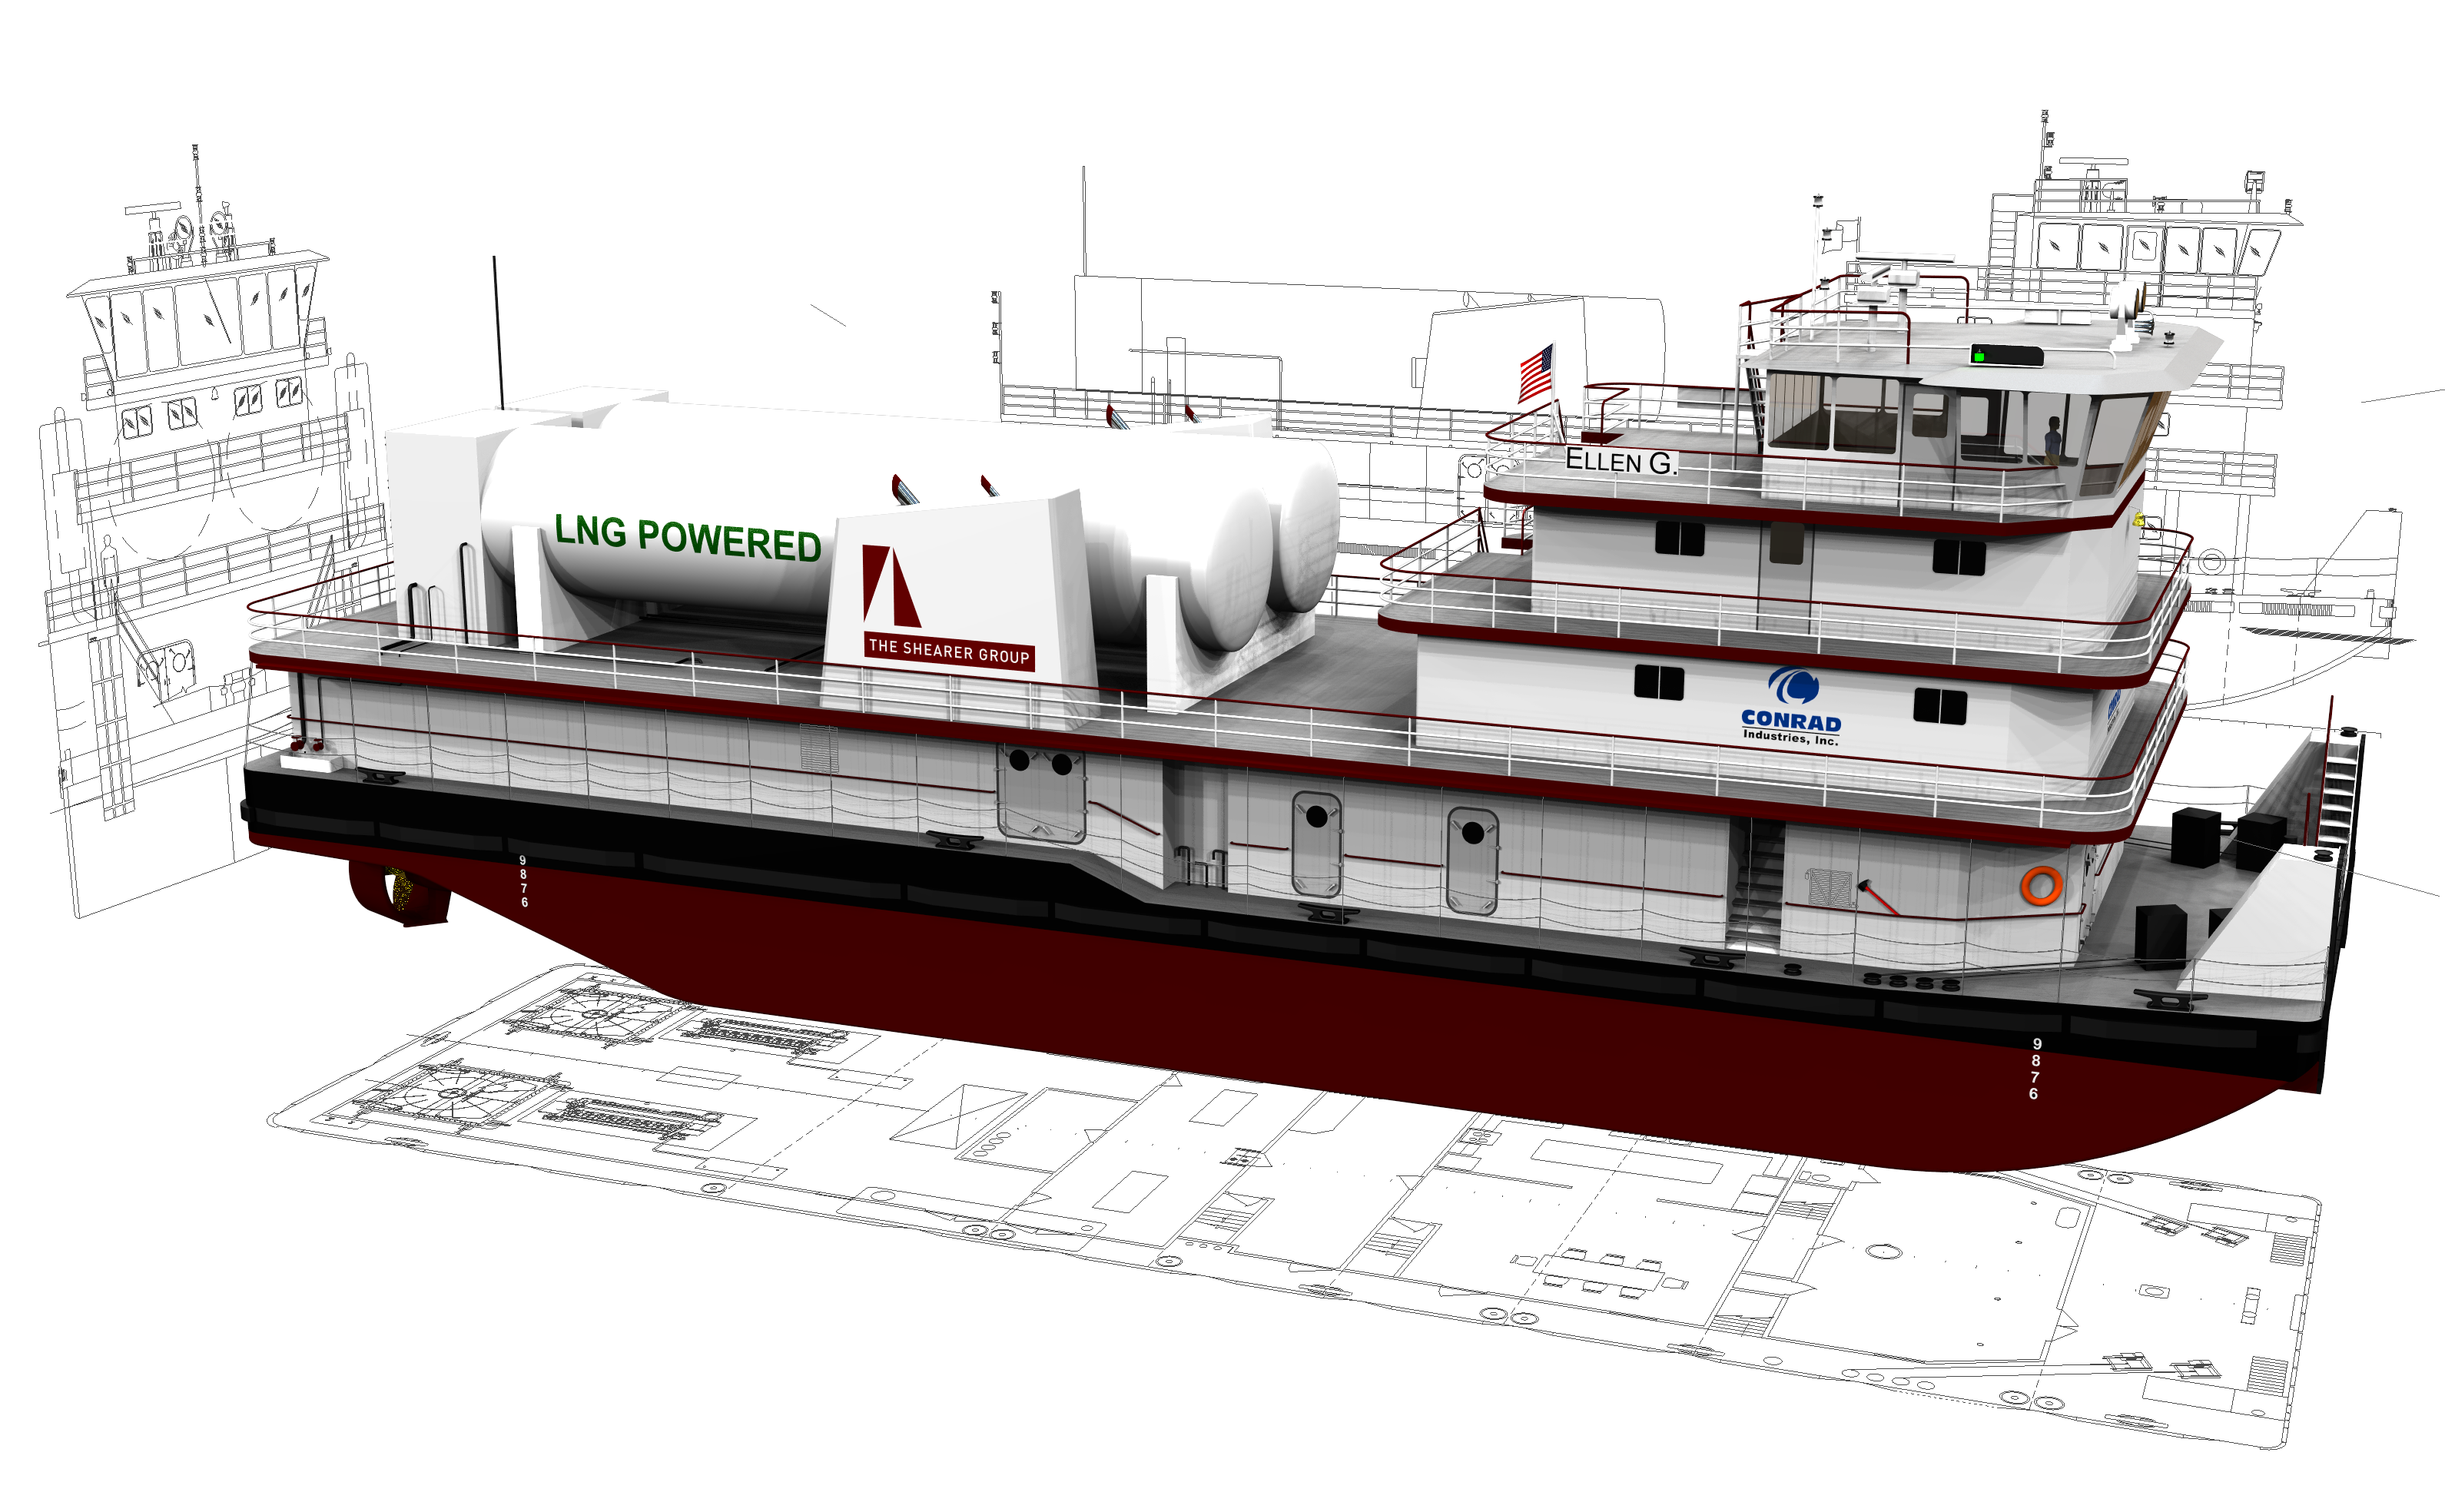 the-shearer-group-inc-and-conrad-shipyard-l-l-c-re-1